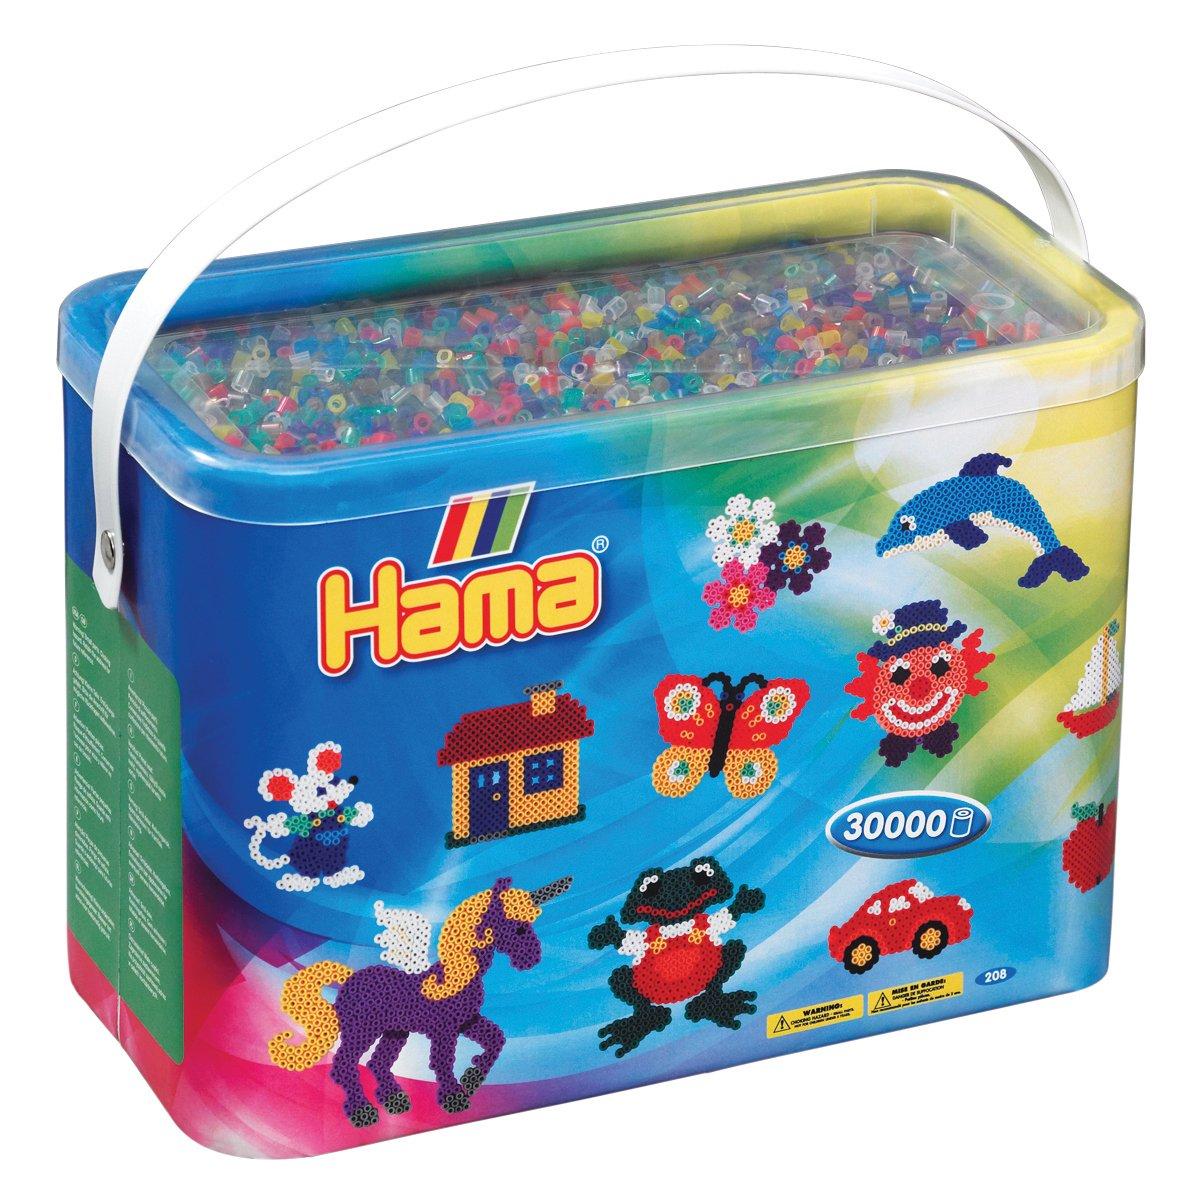 Hama - 208-50 - Mondo Creativo - Midi Baril - 30000 Beads - Misto - Pastello